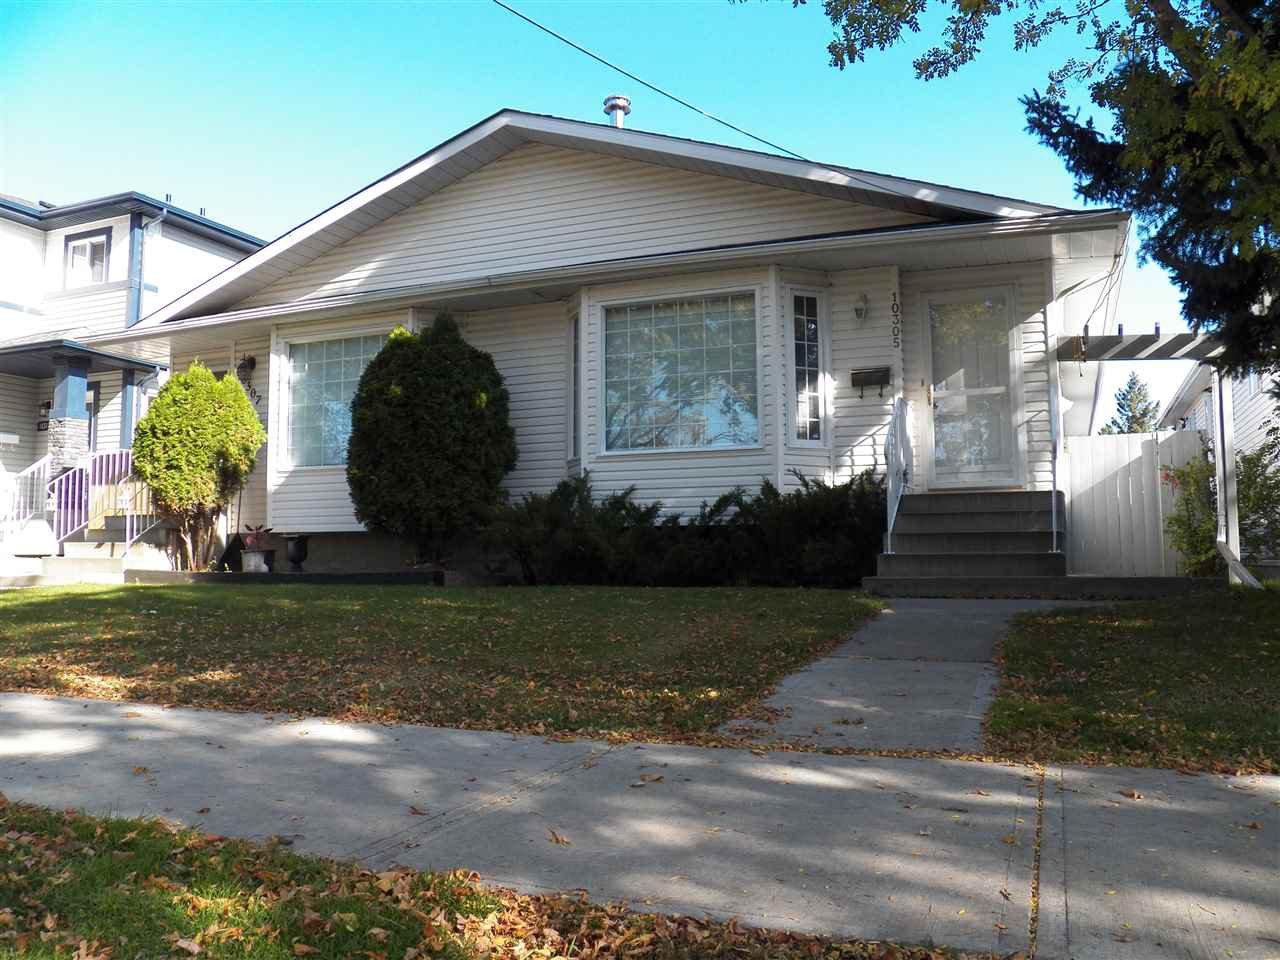 Main Photo: 10305 152 Street in Edmonton: Zone 21 House Half Duplex for sale : MLS®# E4176080